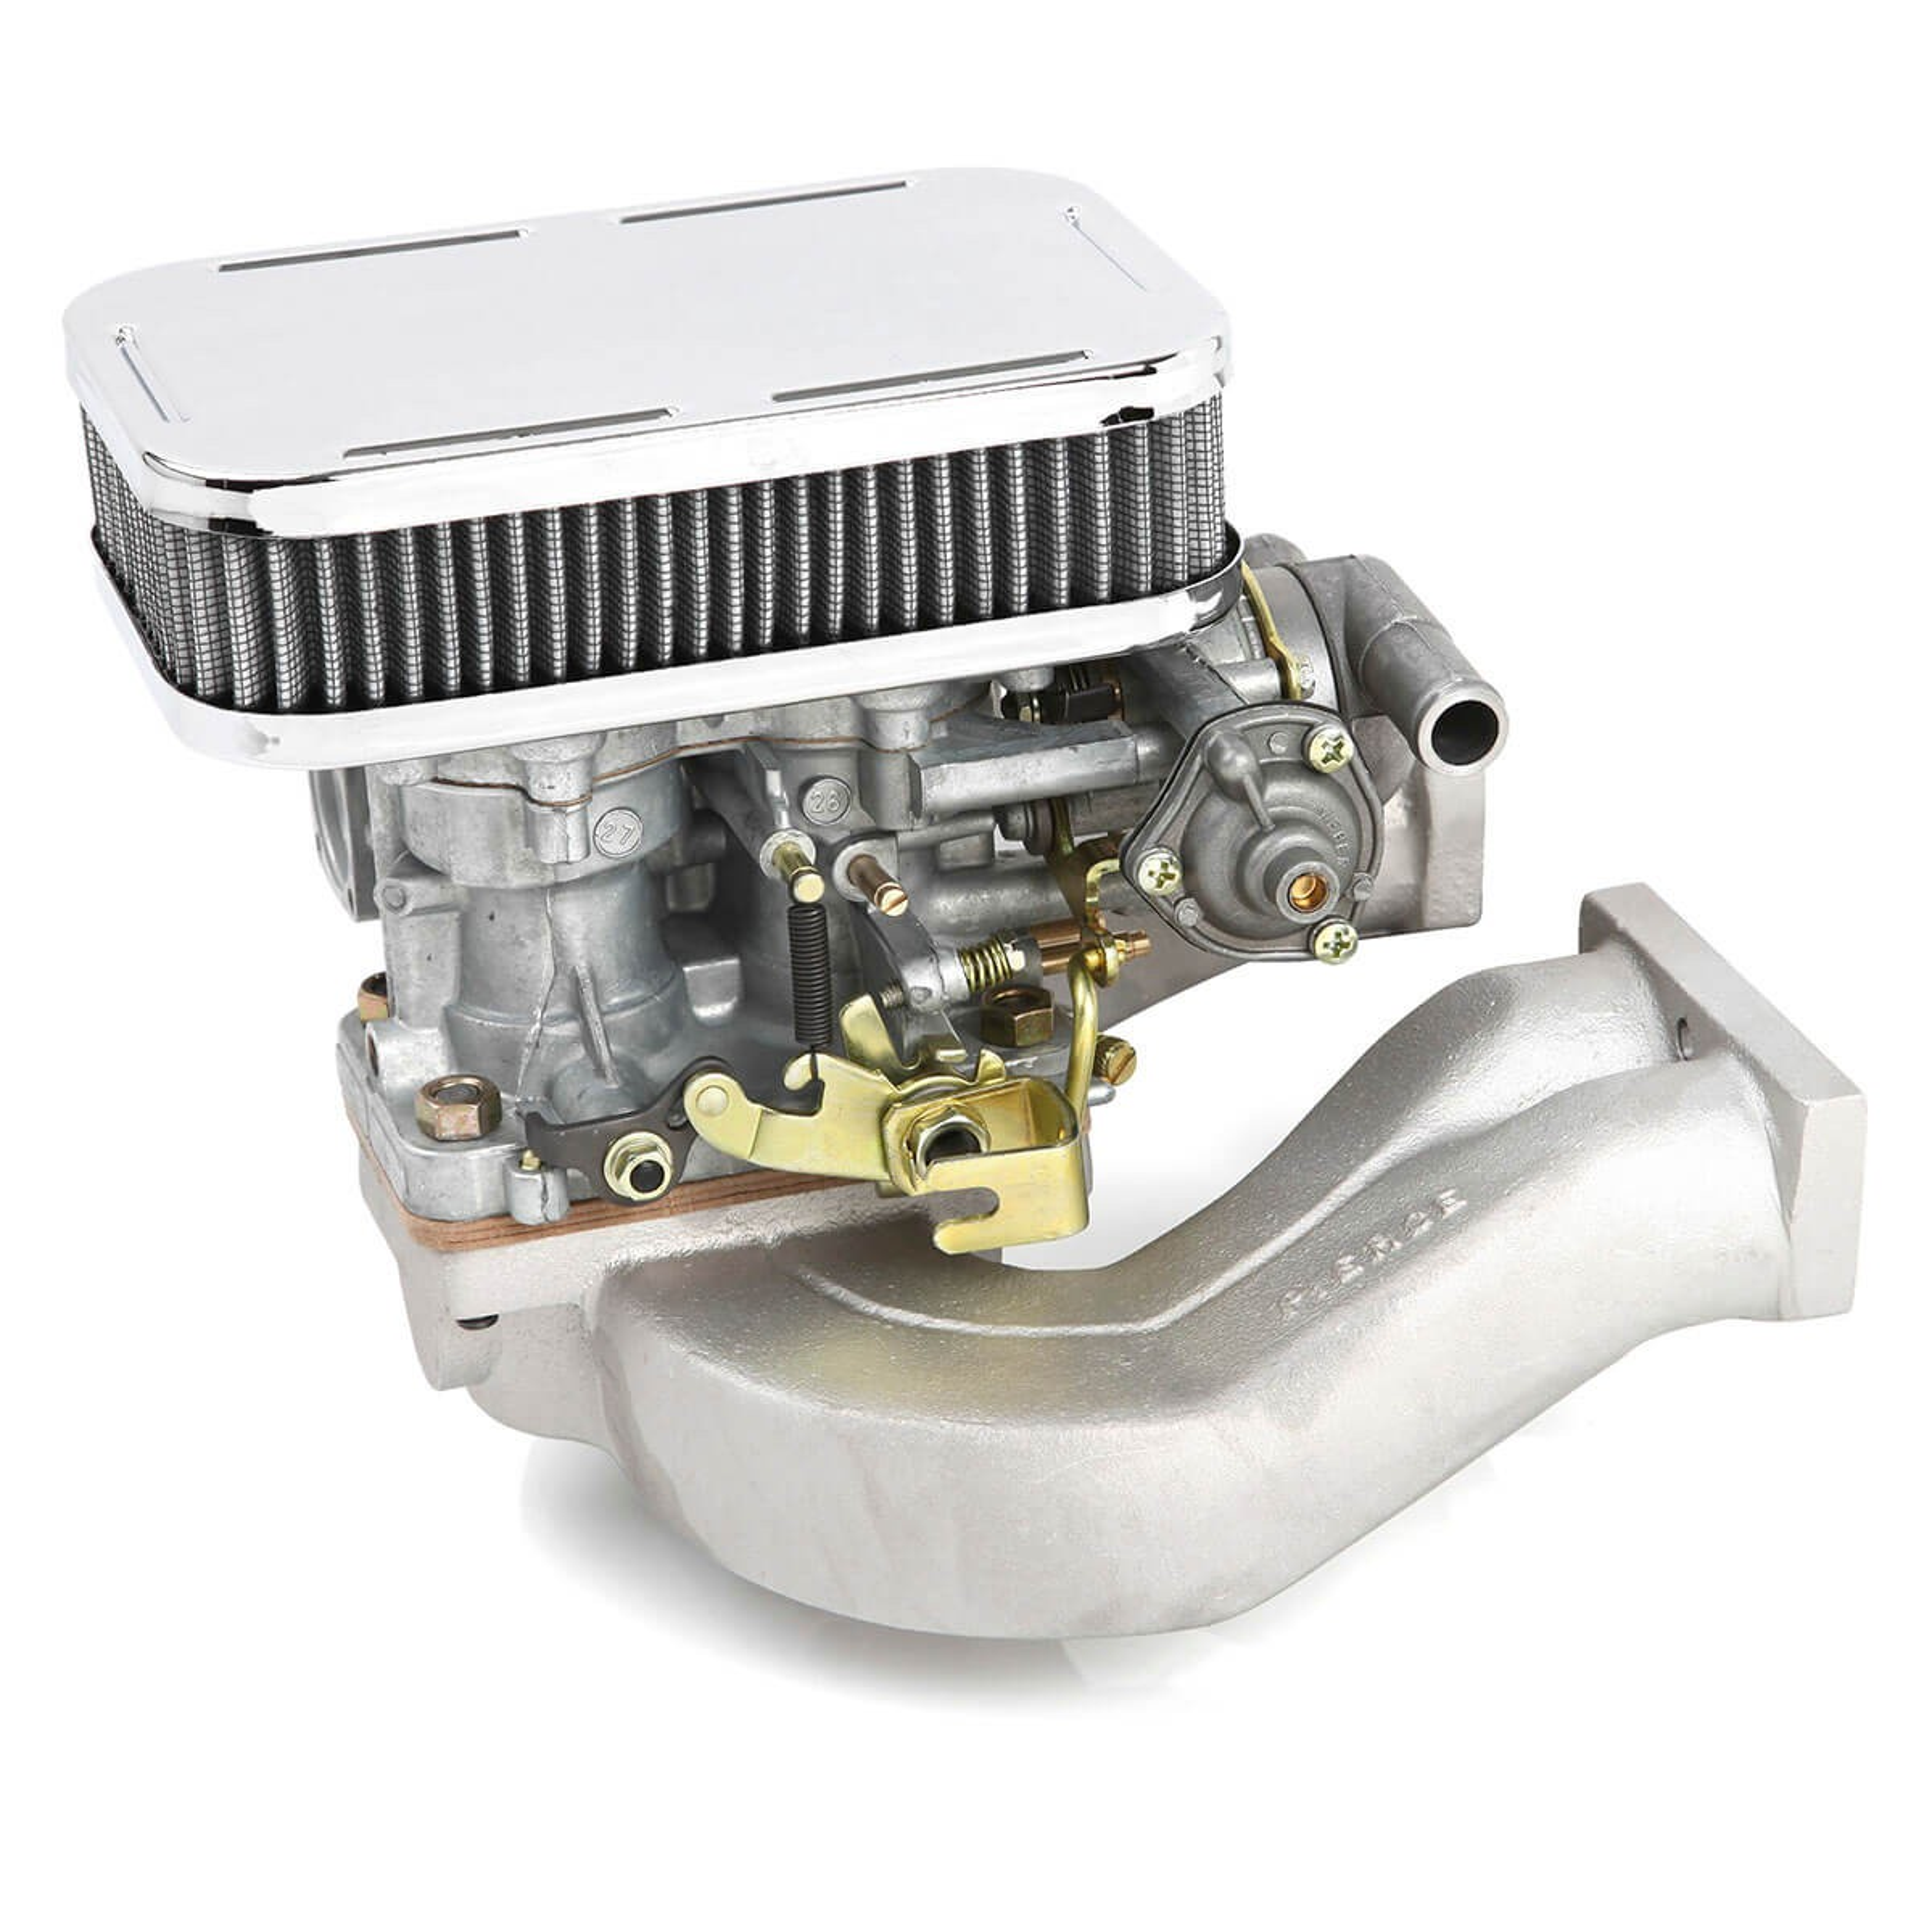 Weber Carburetor Conversion Kit, Downdraft, 1500 - Carburetors